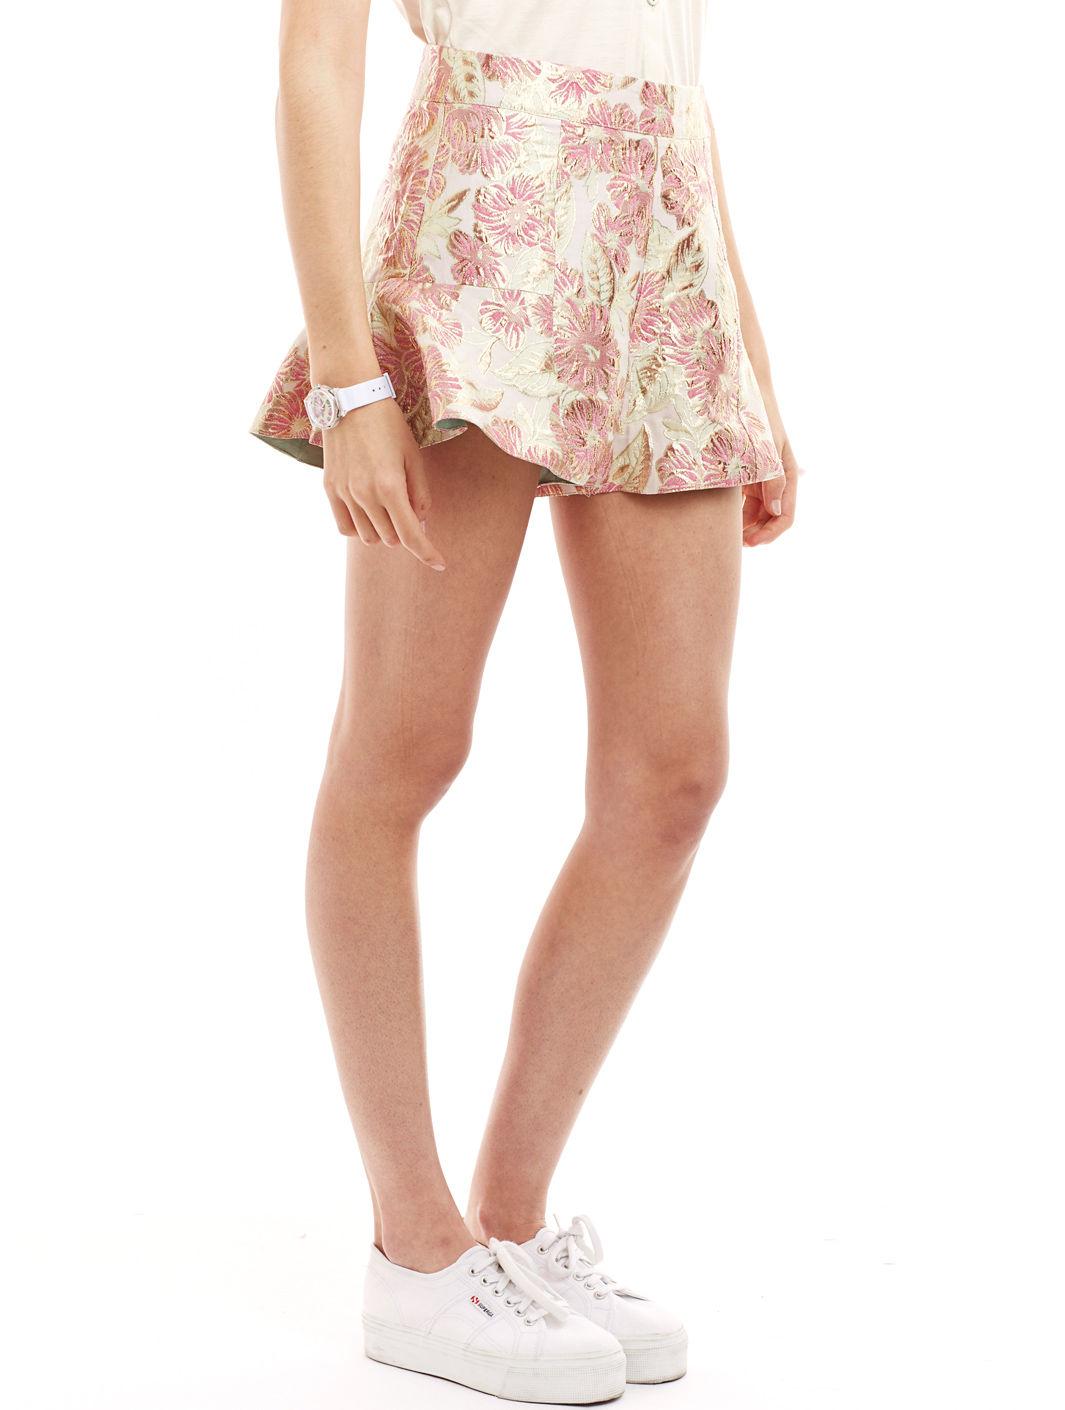 Alix Pink Shorts - Women's Bottoms Endless Rose - 44221